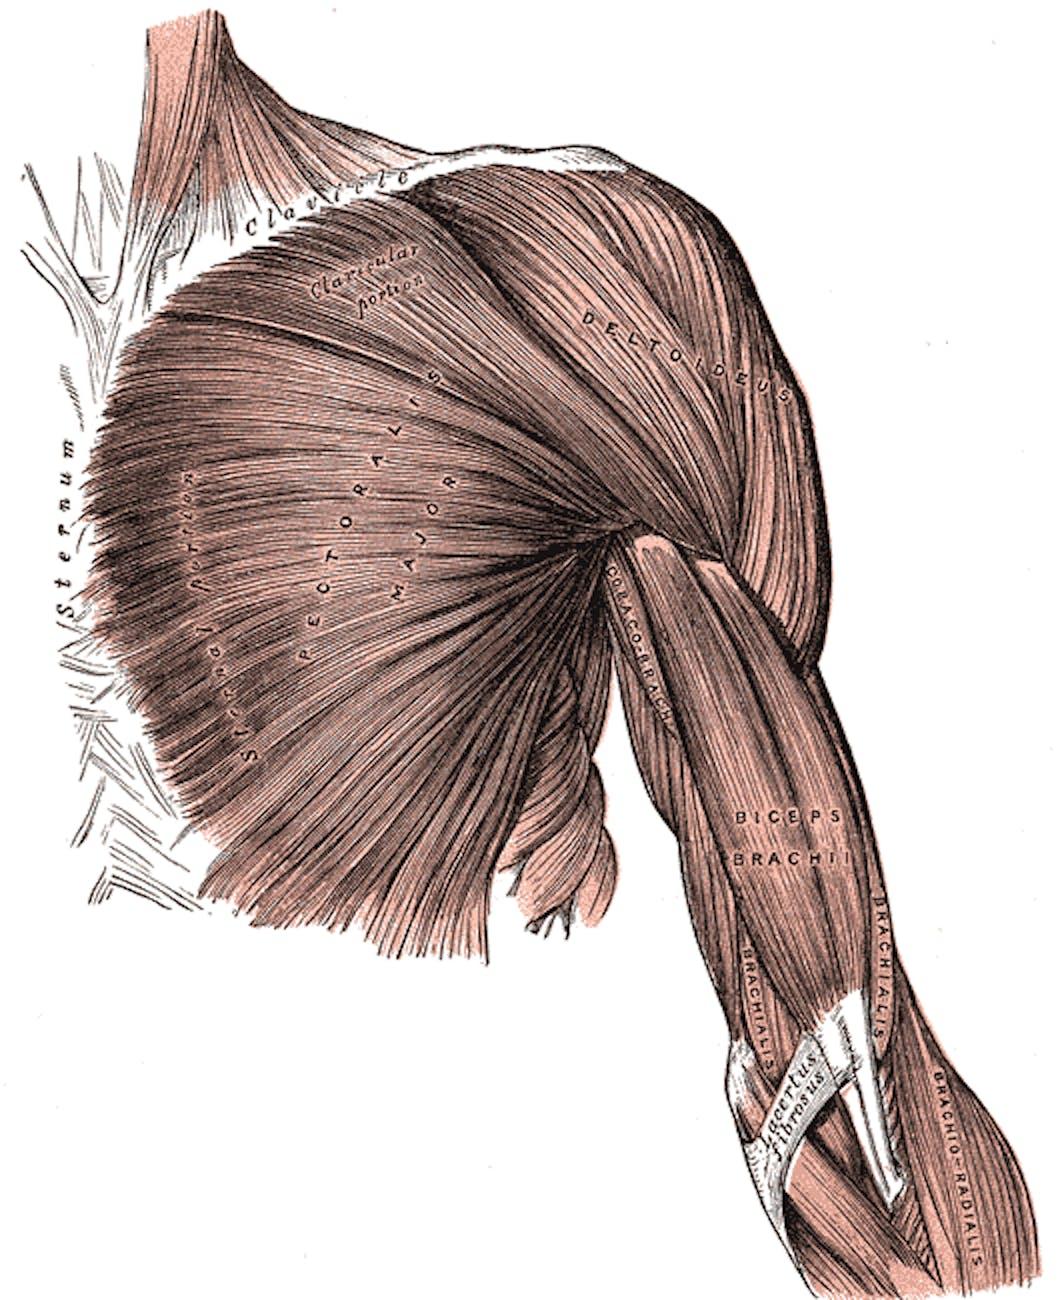 pectoralis major grey's anatomy